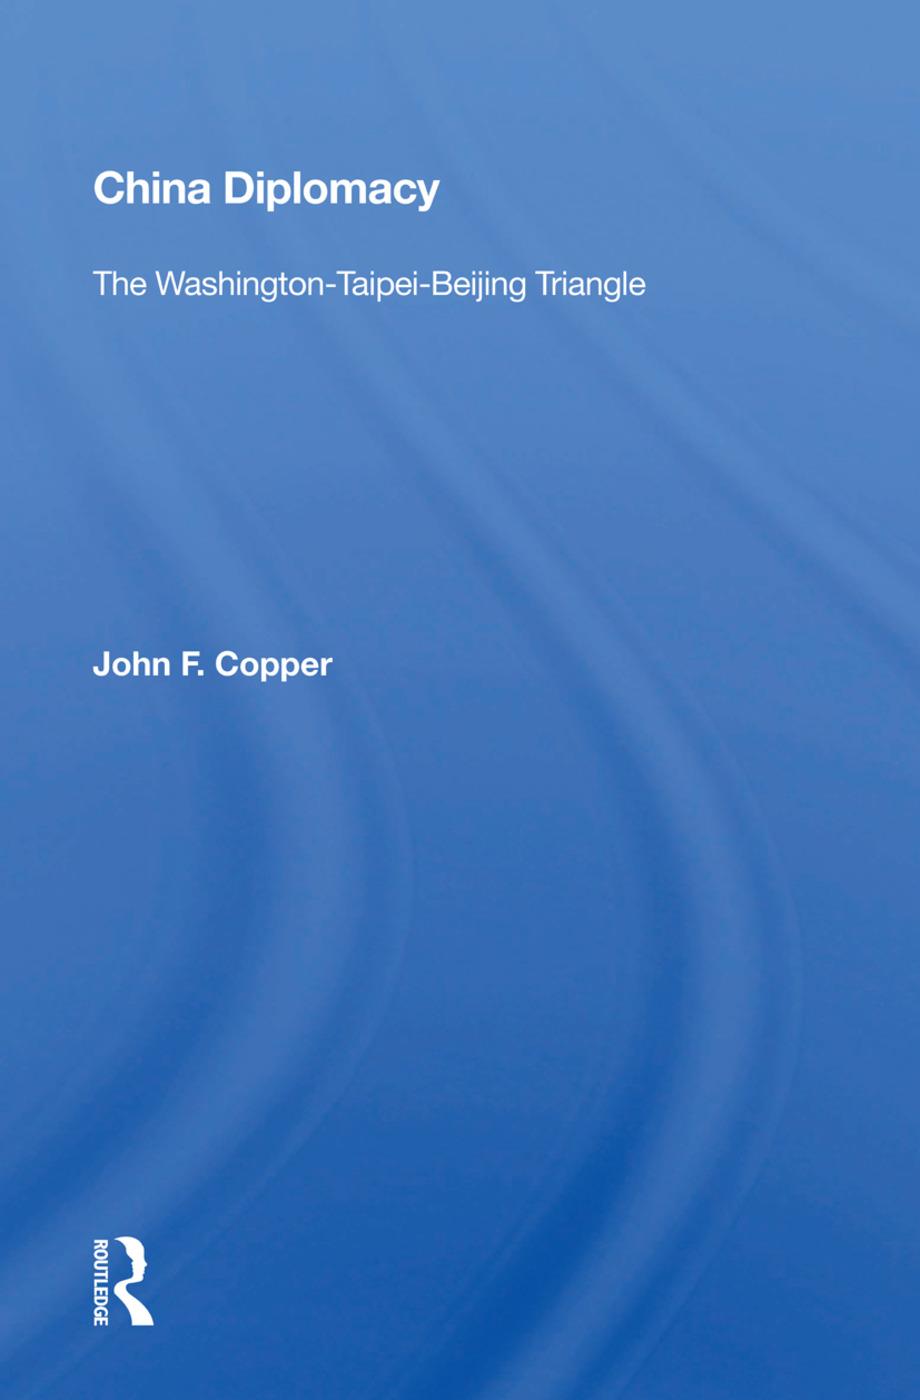 China Diplomacy: The Washington-Taipei-Beijing Triangle book cover